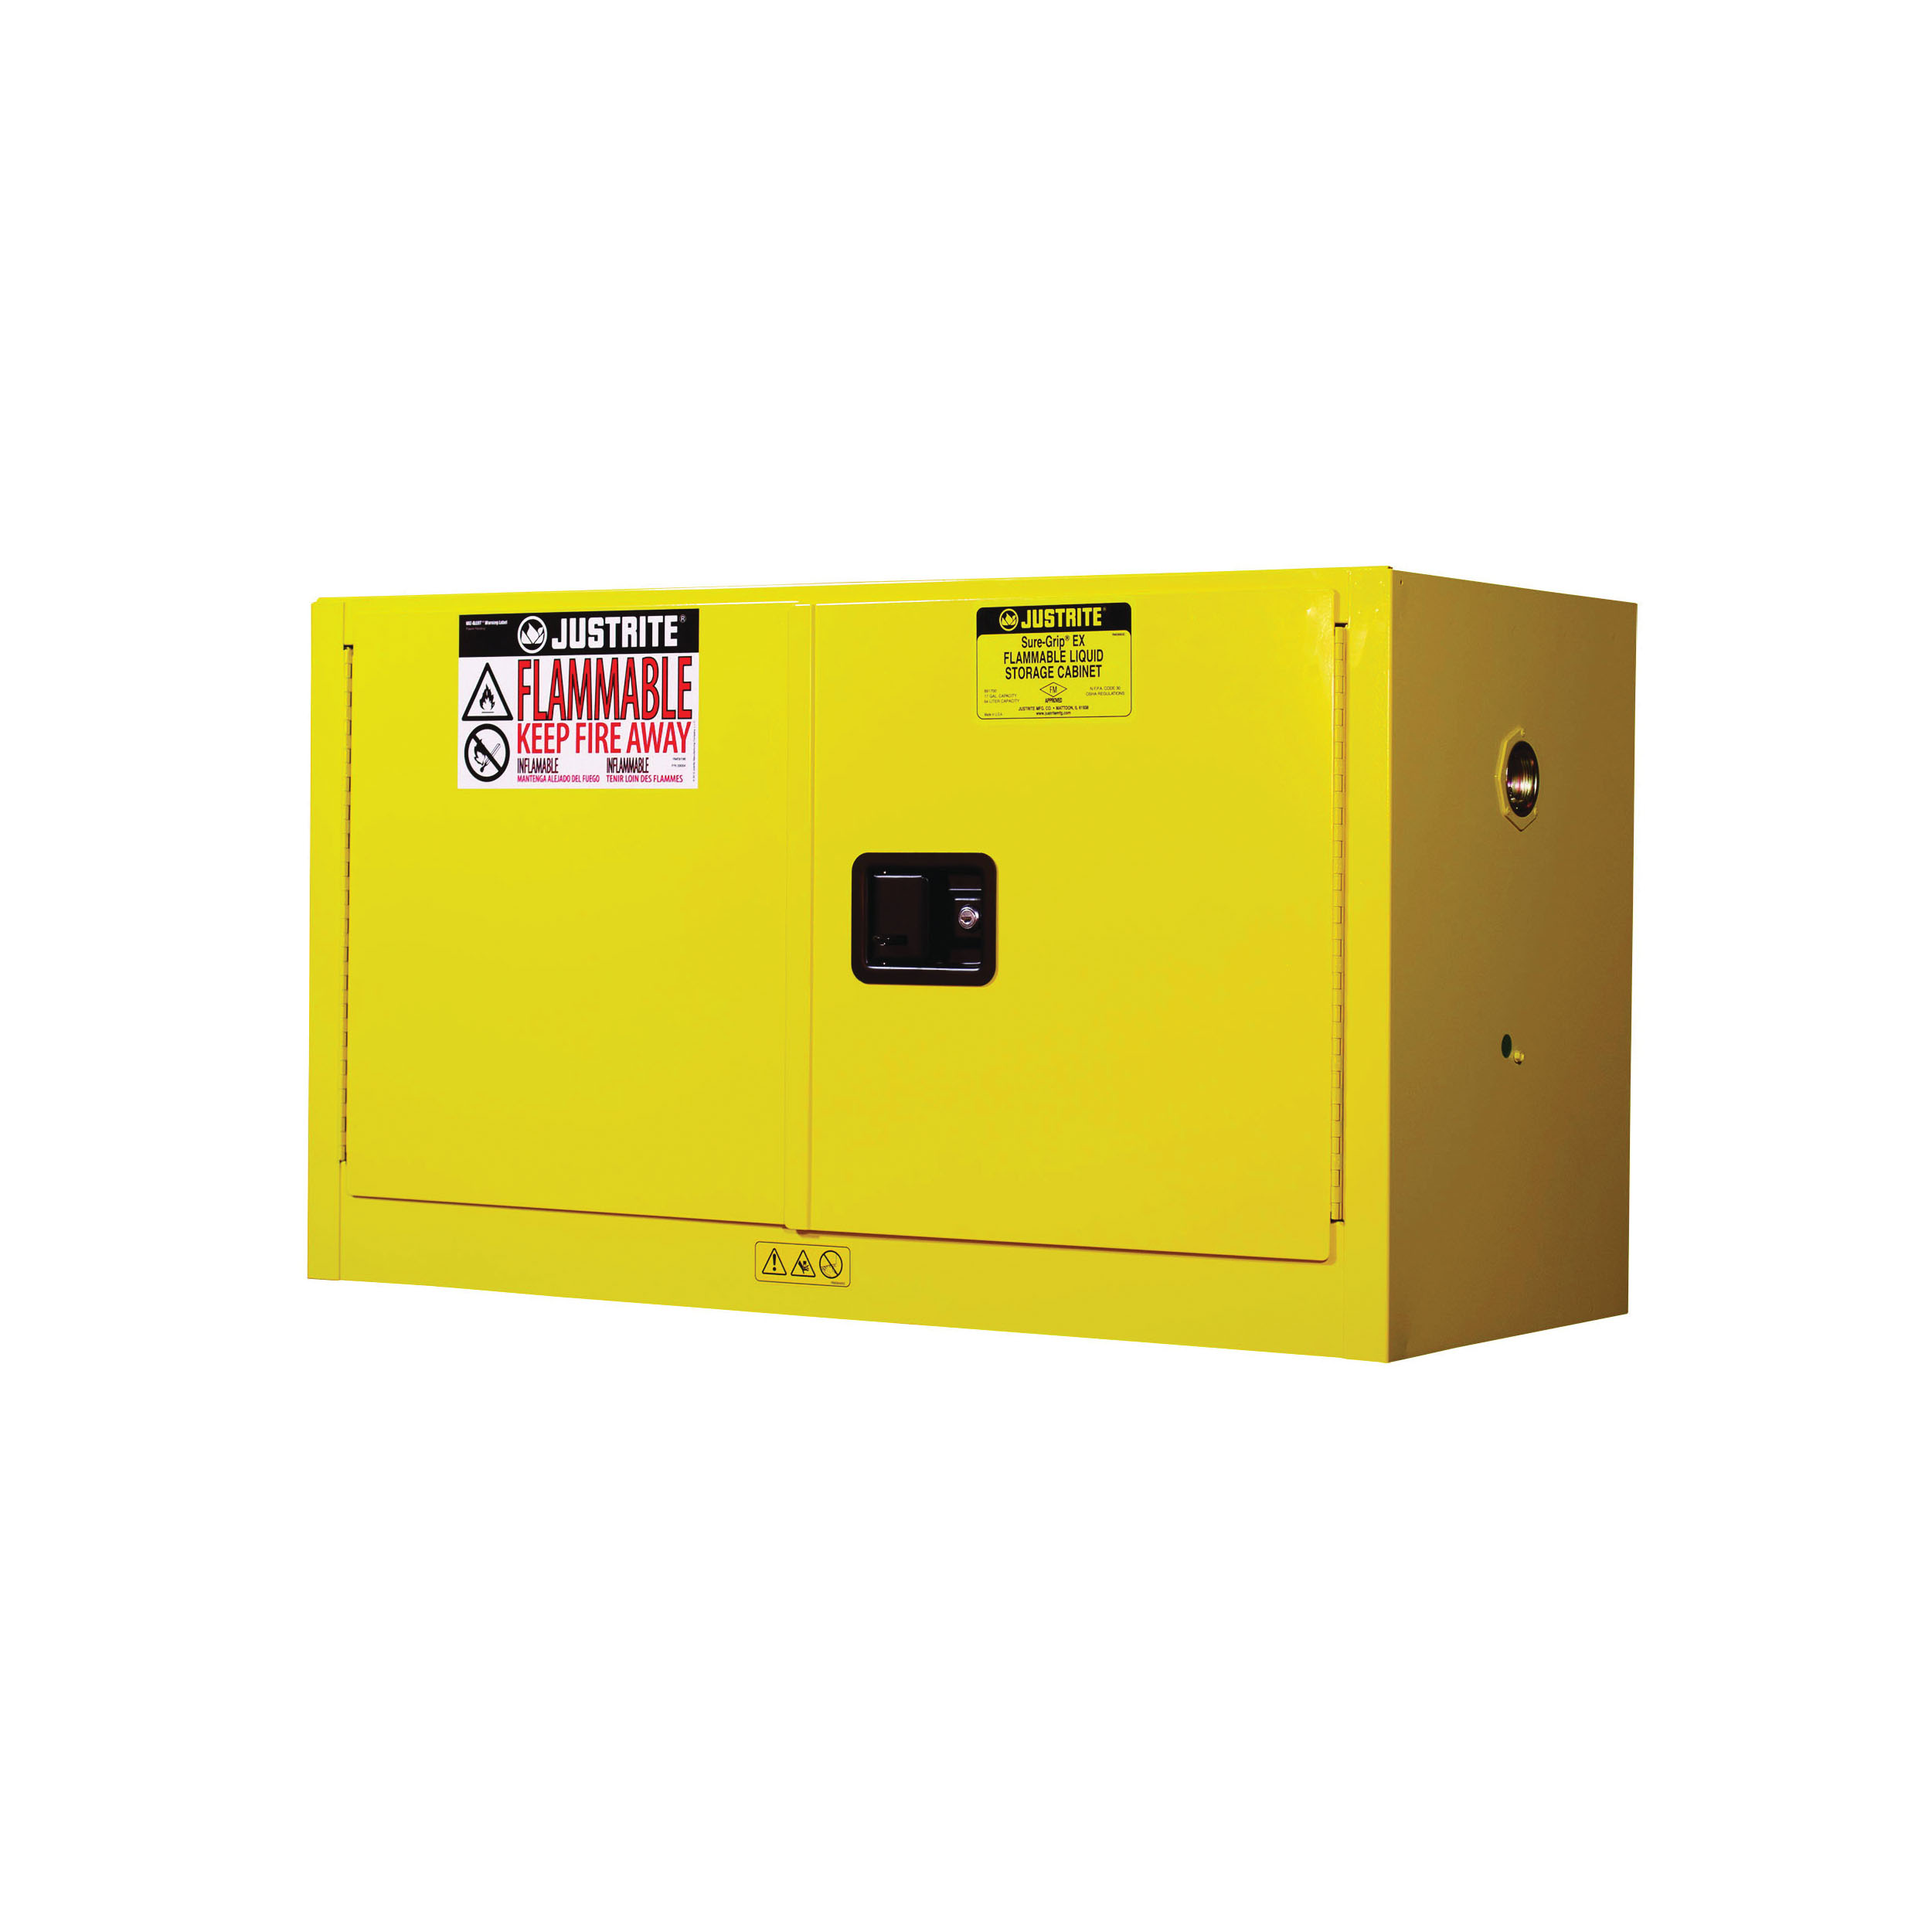 Justrite® 891700 Sure-Grip® EX Piggyback Flammable Safety Cabinet, 17 gal Capacity, U-Loc™ Handle, 24 in H x 43 in W x 18 in D, Manual Close Door, 2 Doors, 1 Shelves, Cold Rolled Steel, Yellow